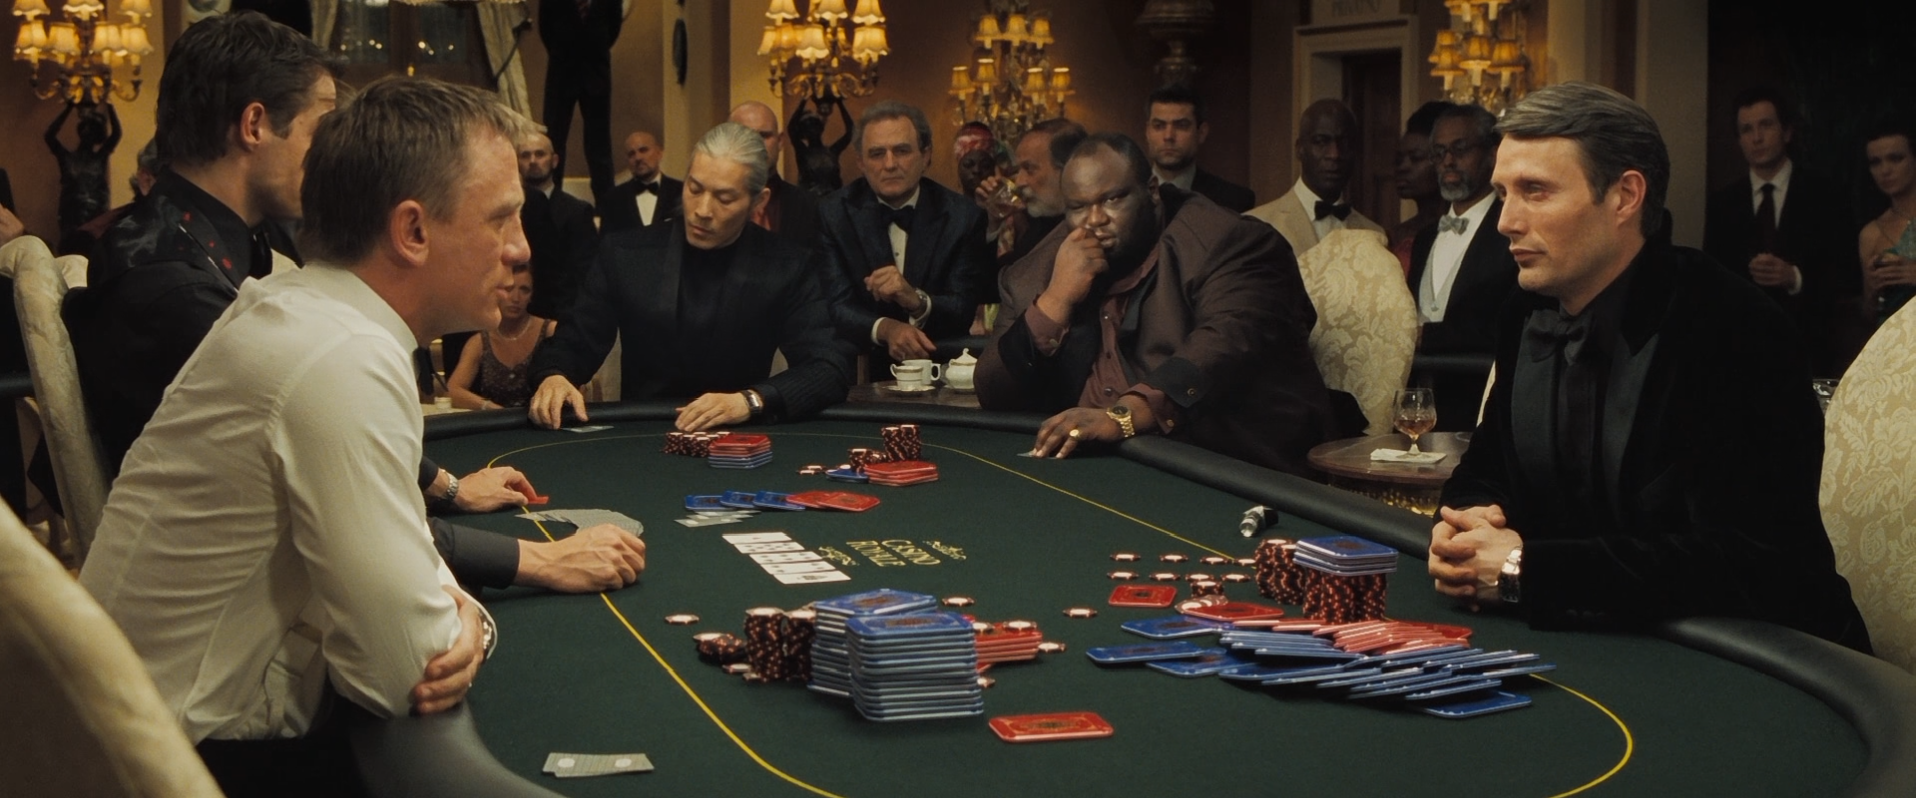 007 casino royale cda